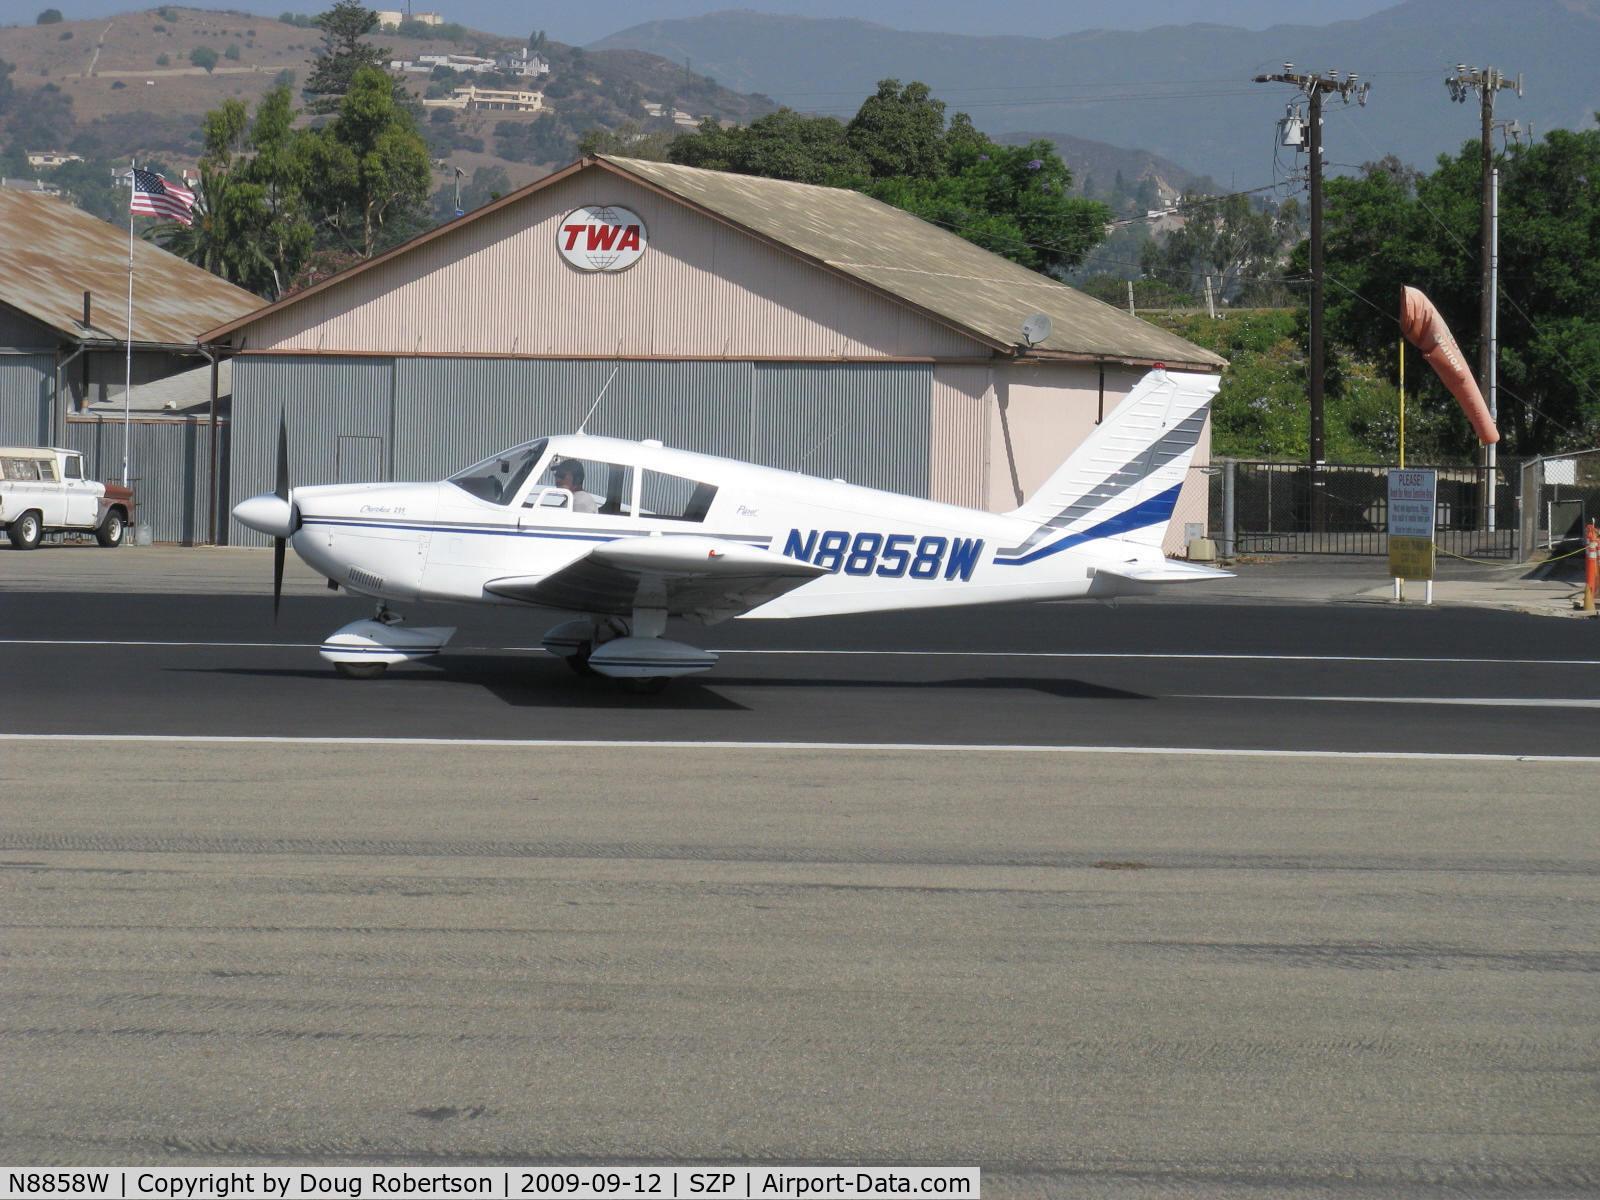 Aircraft N8858W (1964 Piper PA-28-235 C/N 28-10412) Photo by